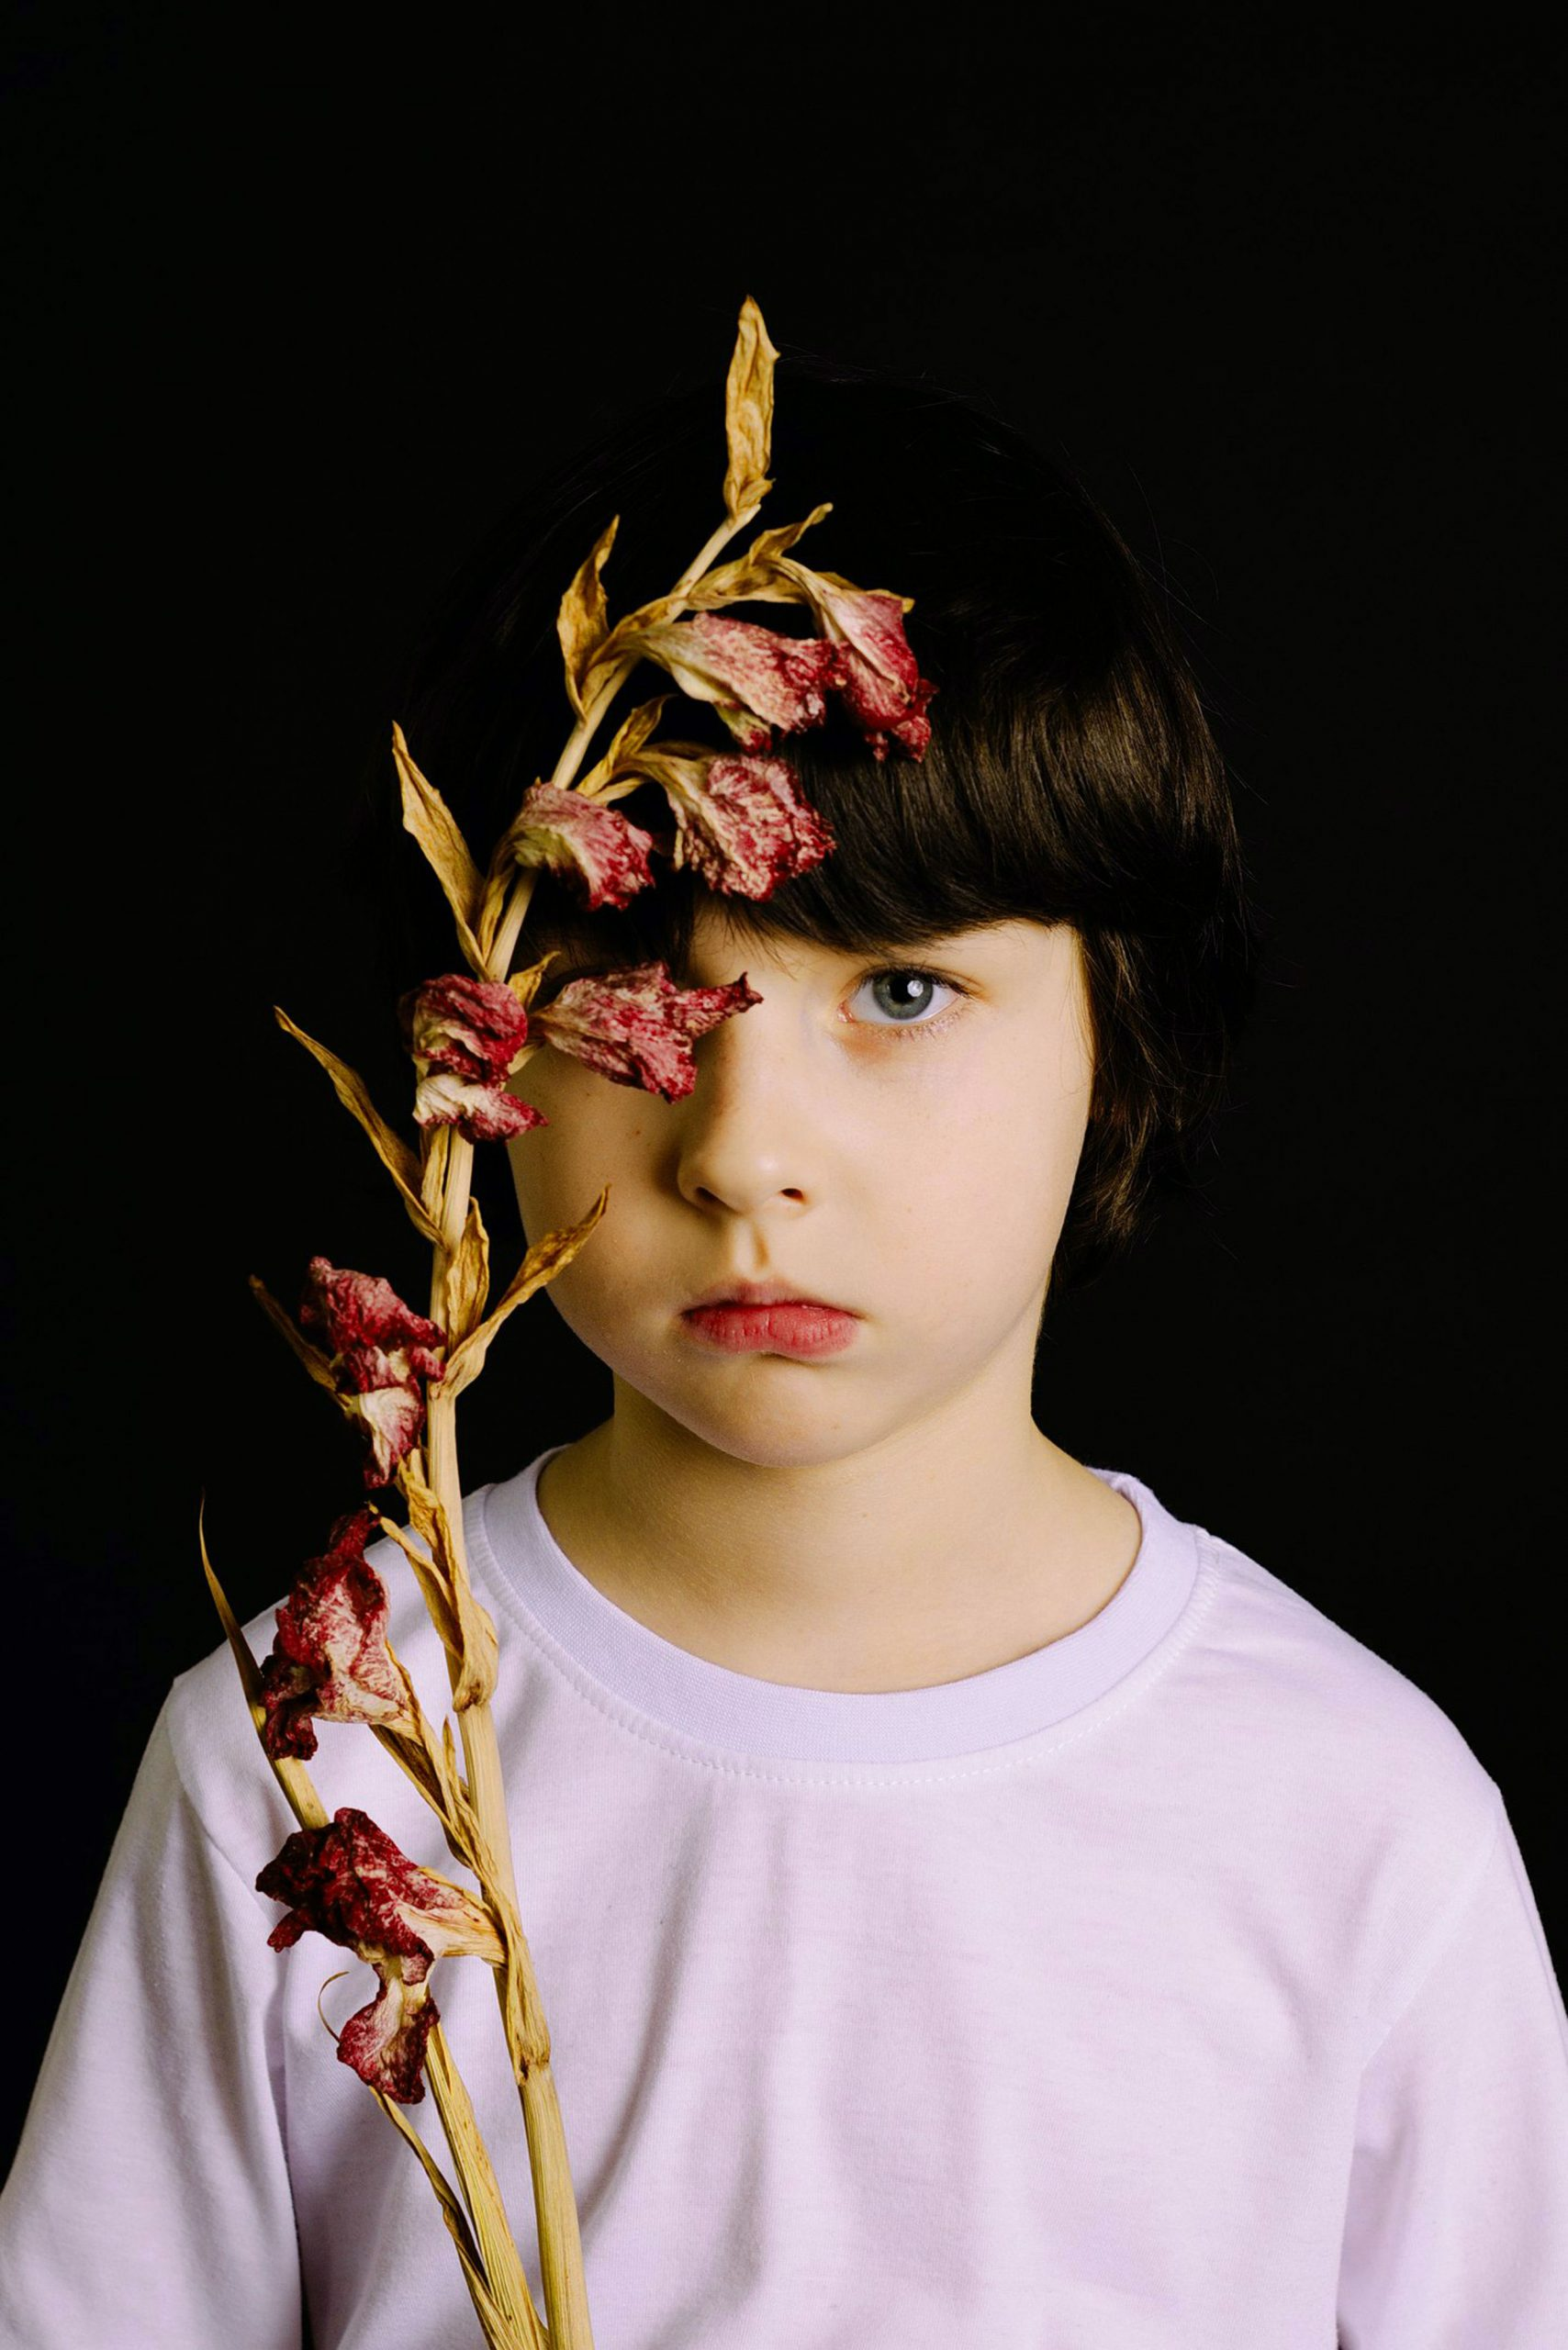 New Sad Boy Whatsapp Dp Images photo download 3